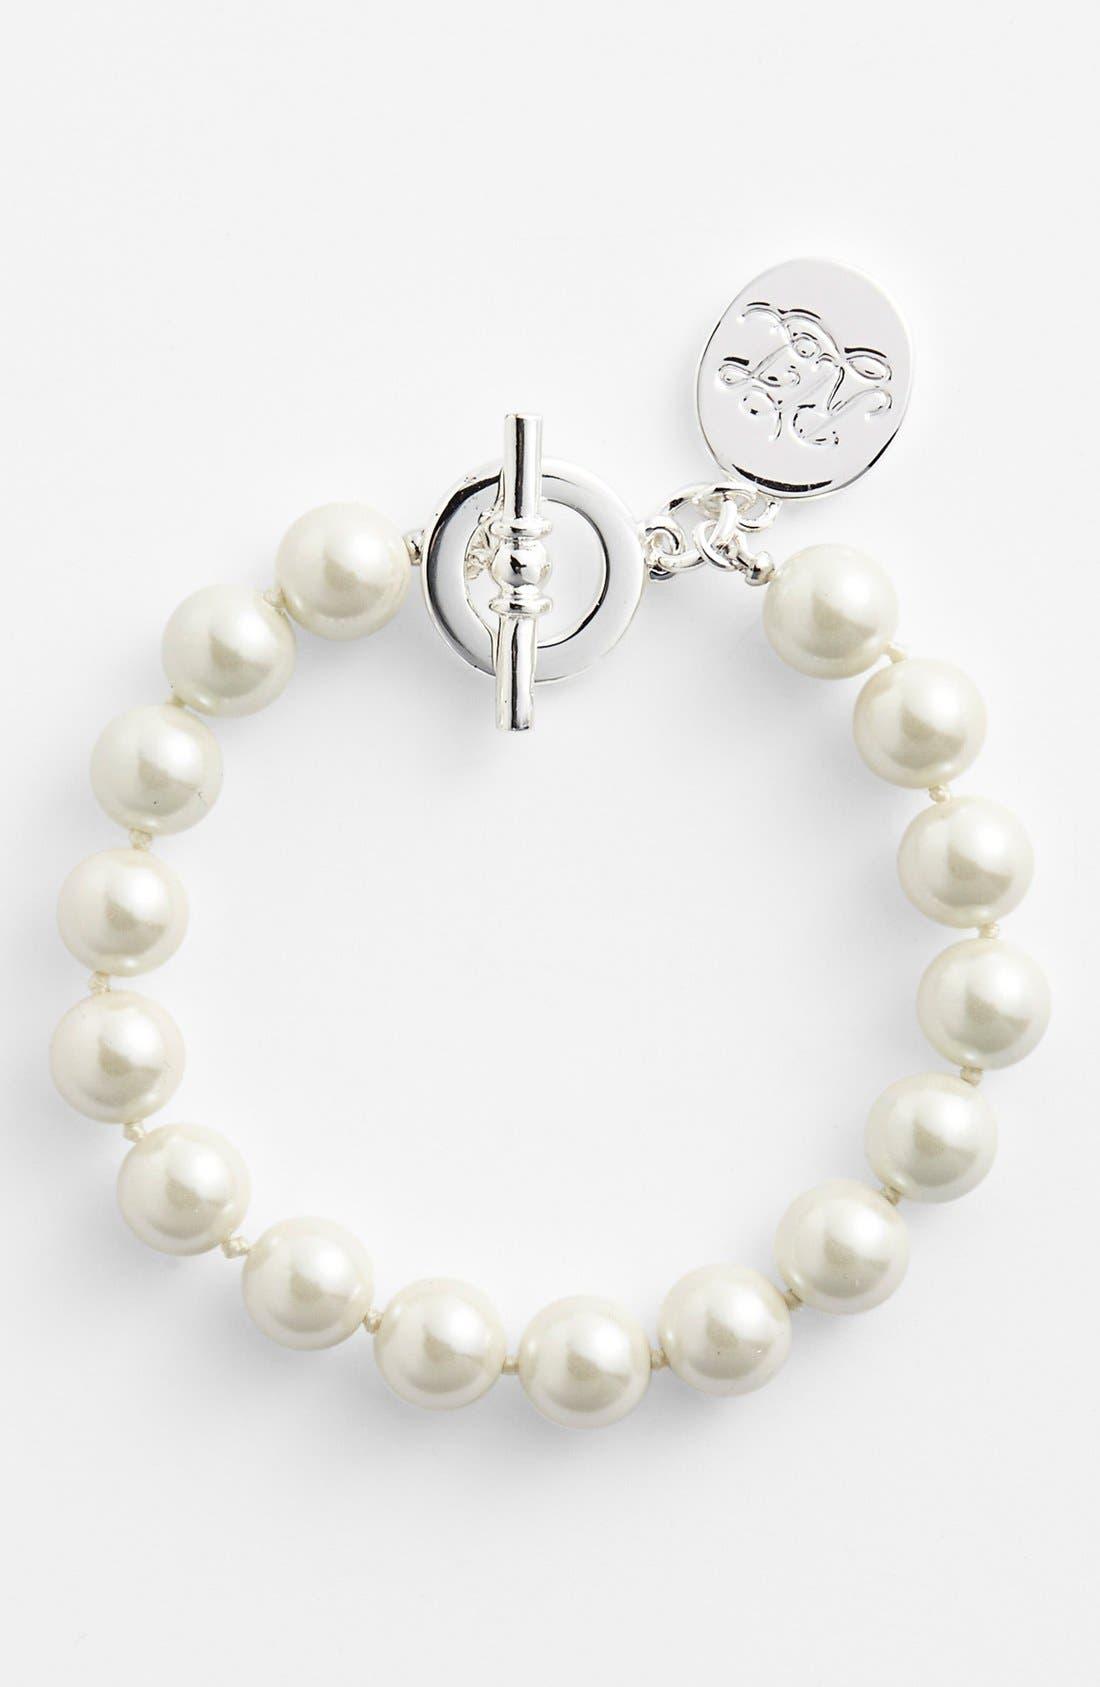 Main Image - Lauren Ralph Lauren 10mm Glass Pearl Toggle Bracelet